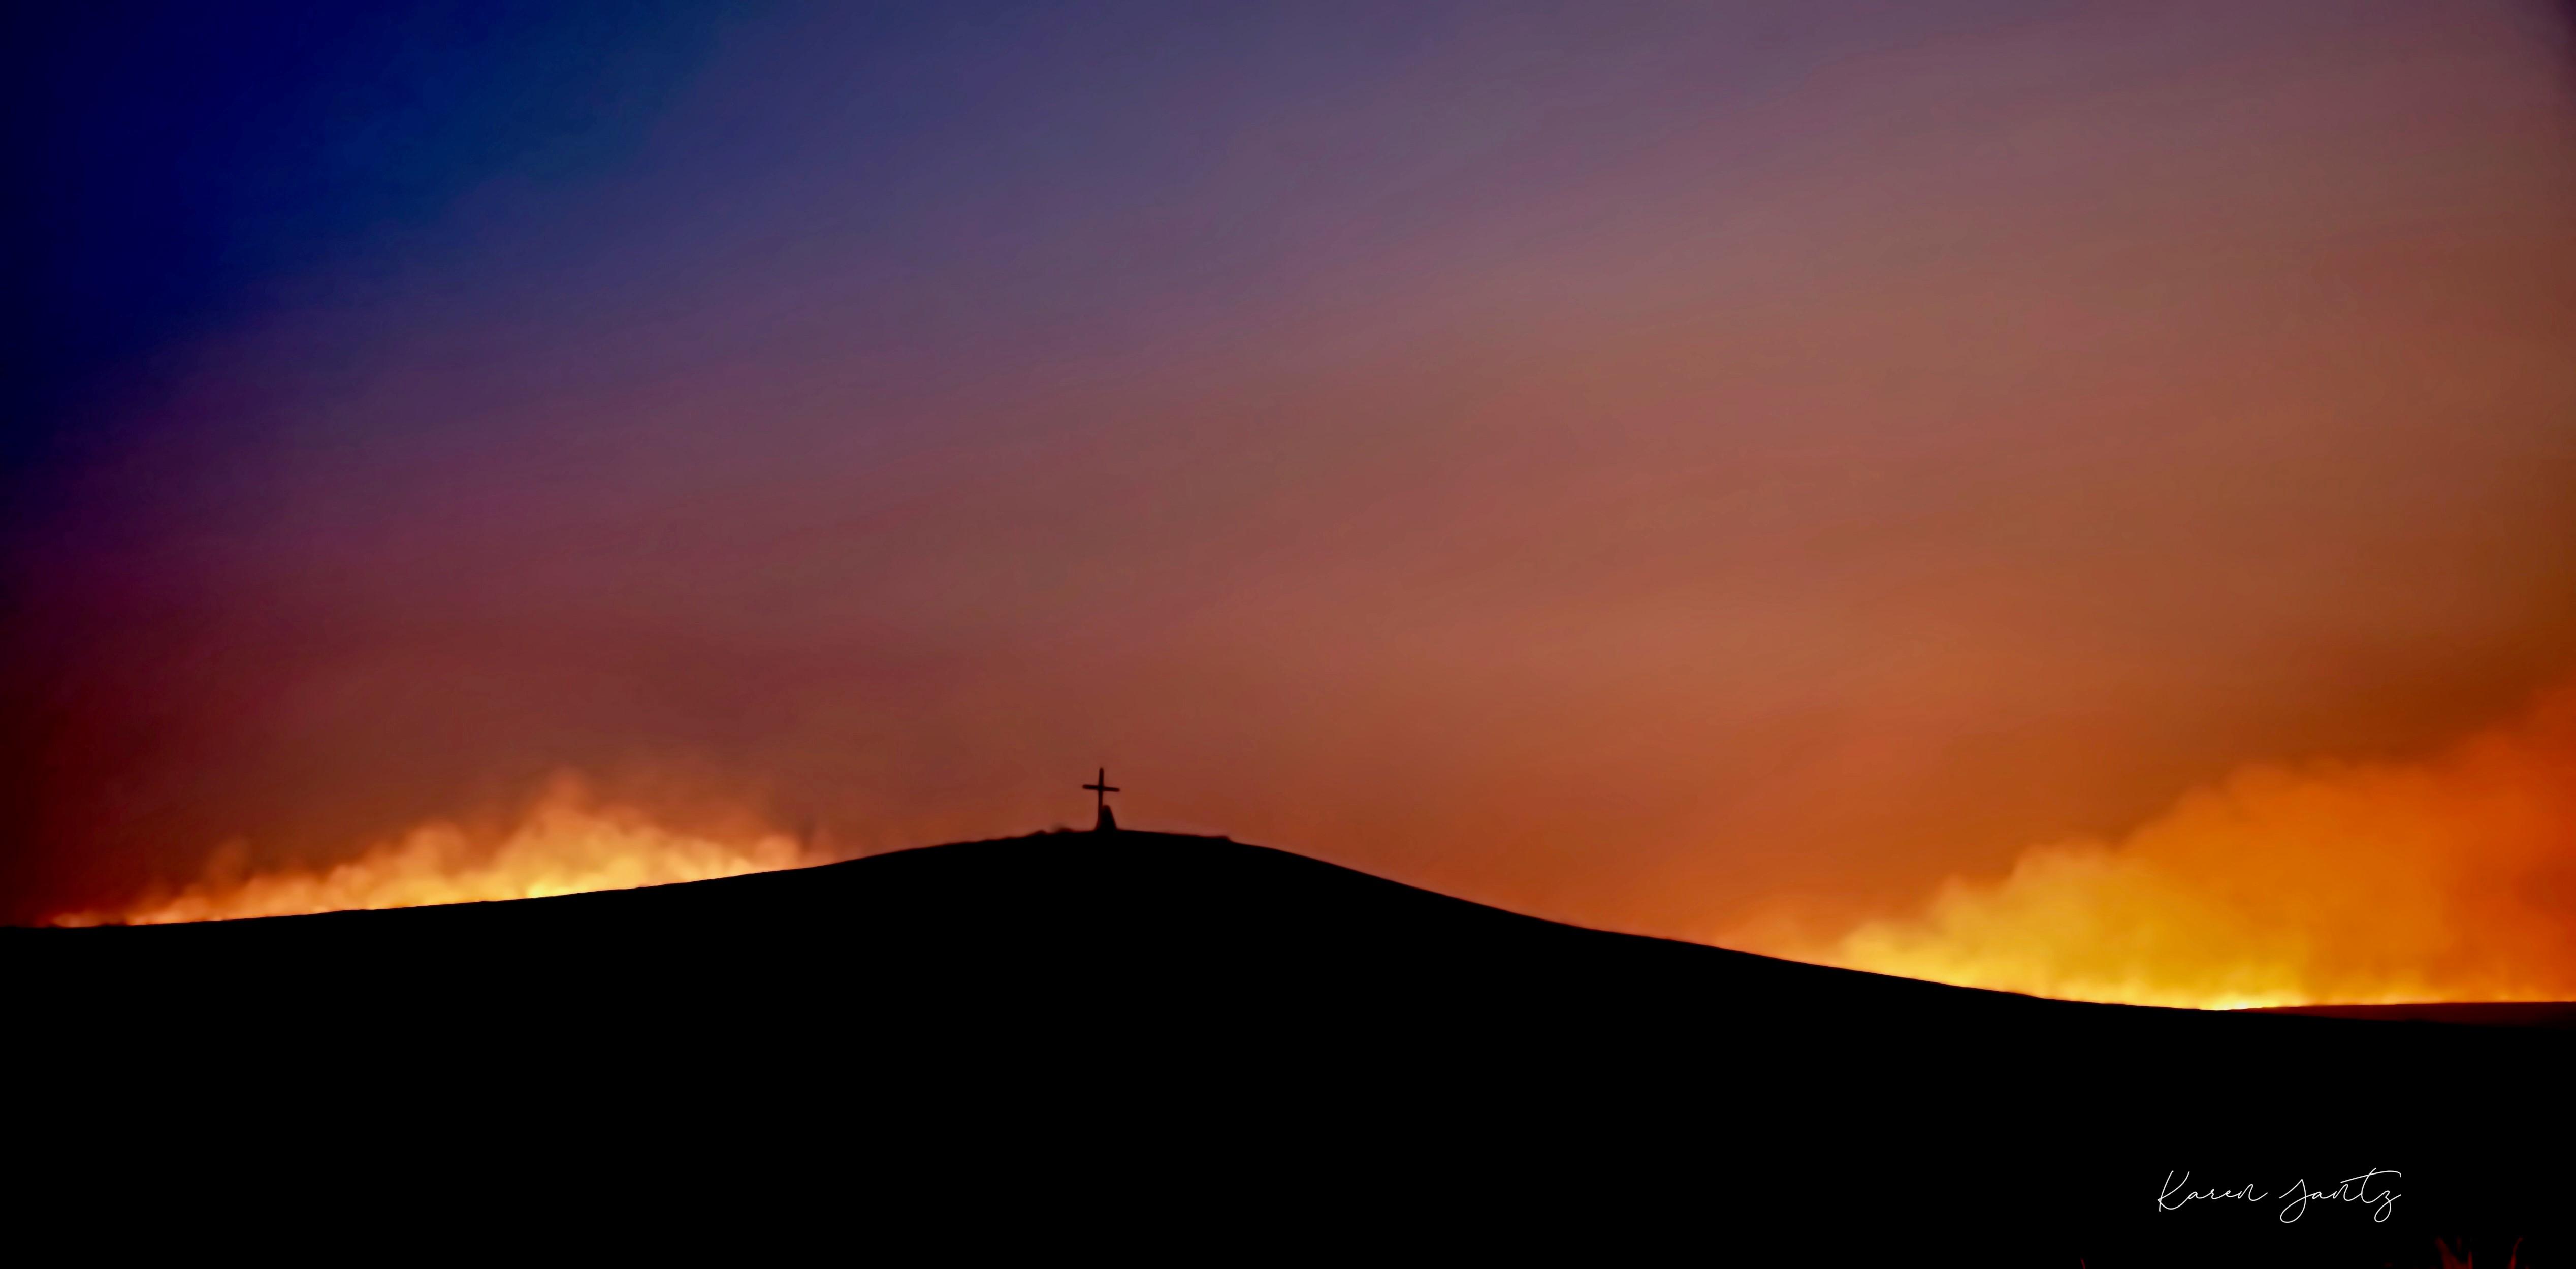 Pasture burning